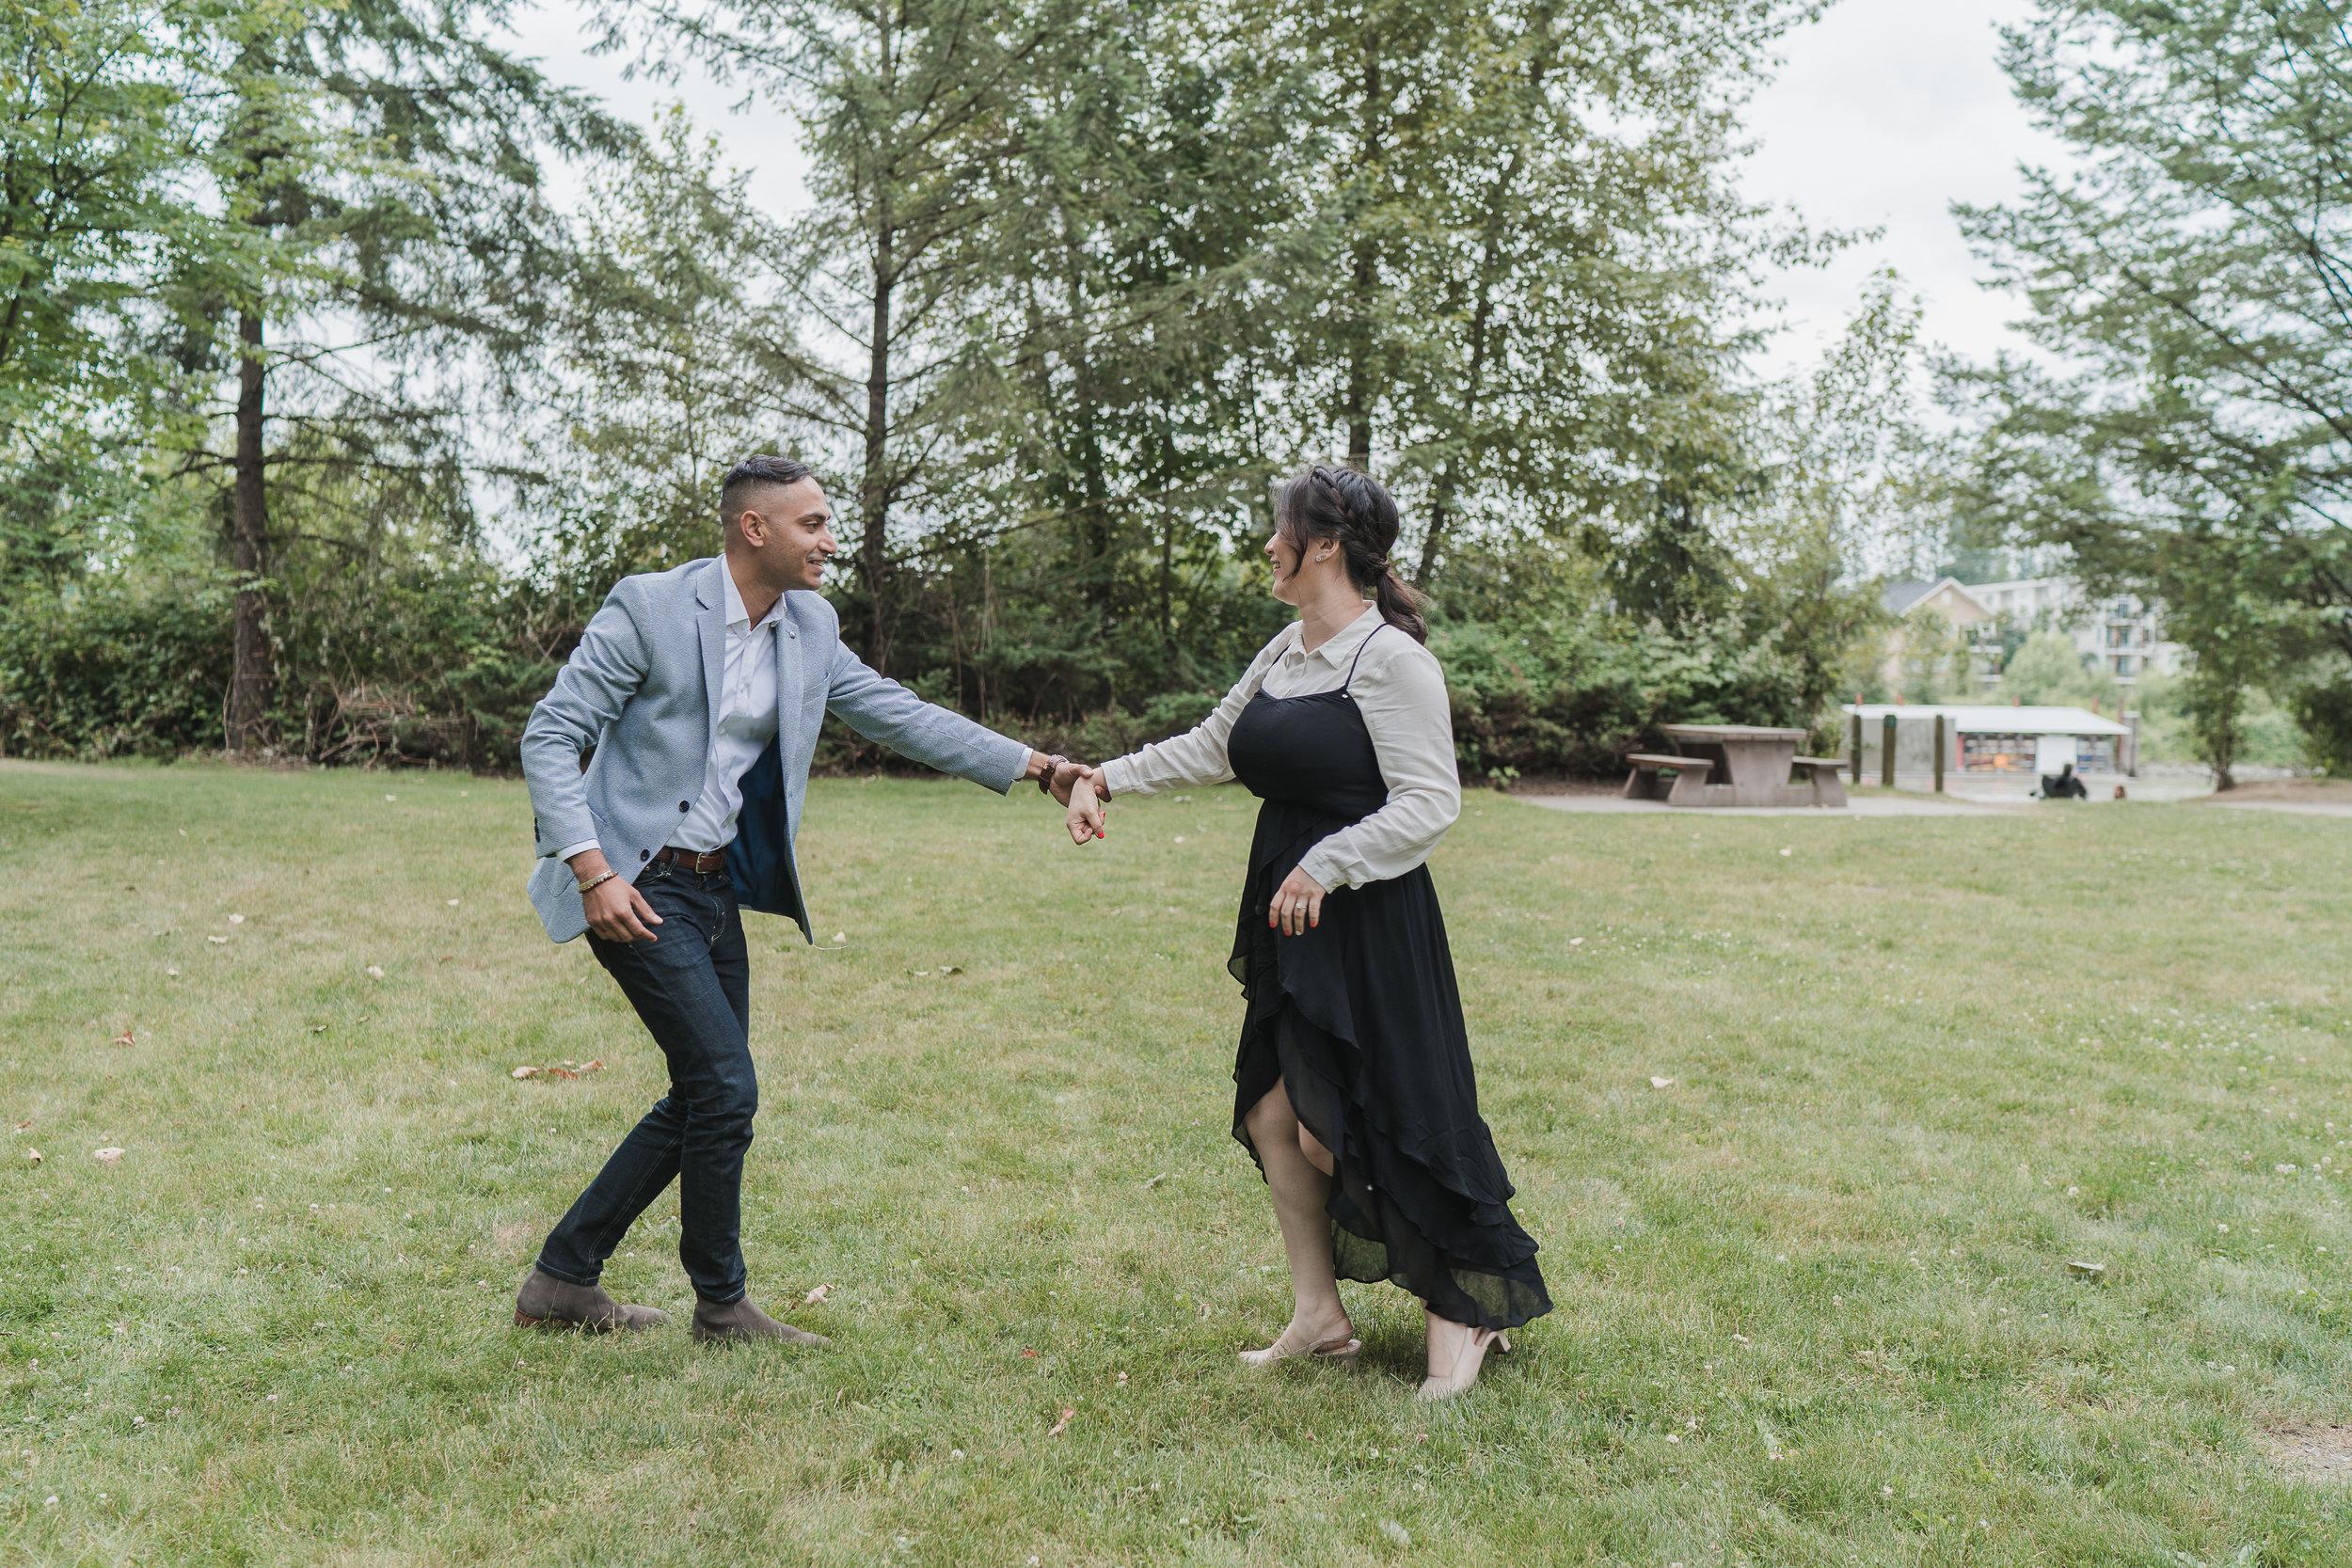 20190622 - Monika & Johnson Engagement- 0061.jpg